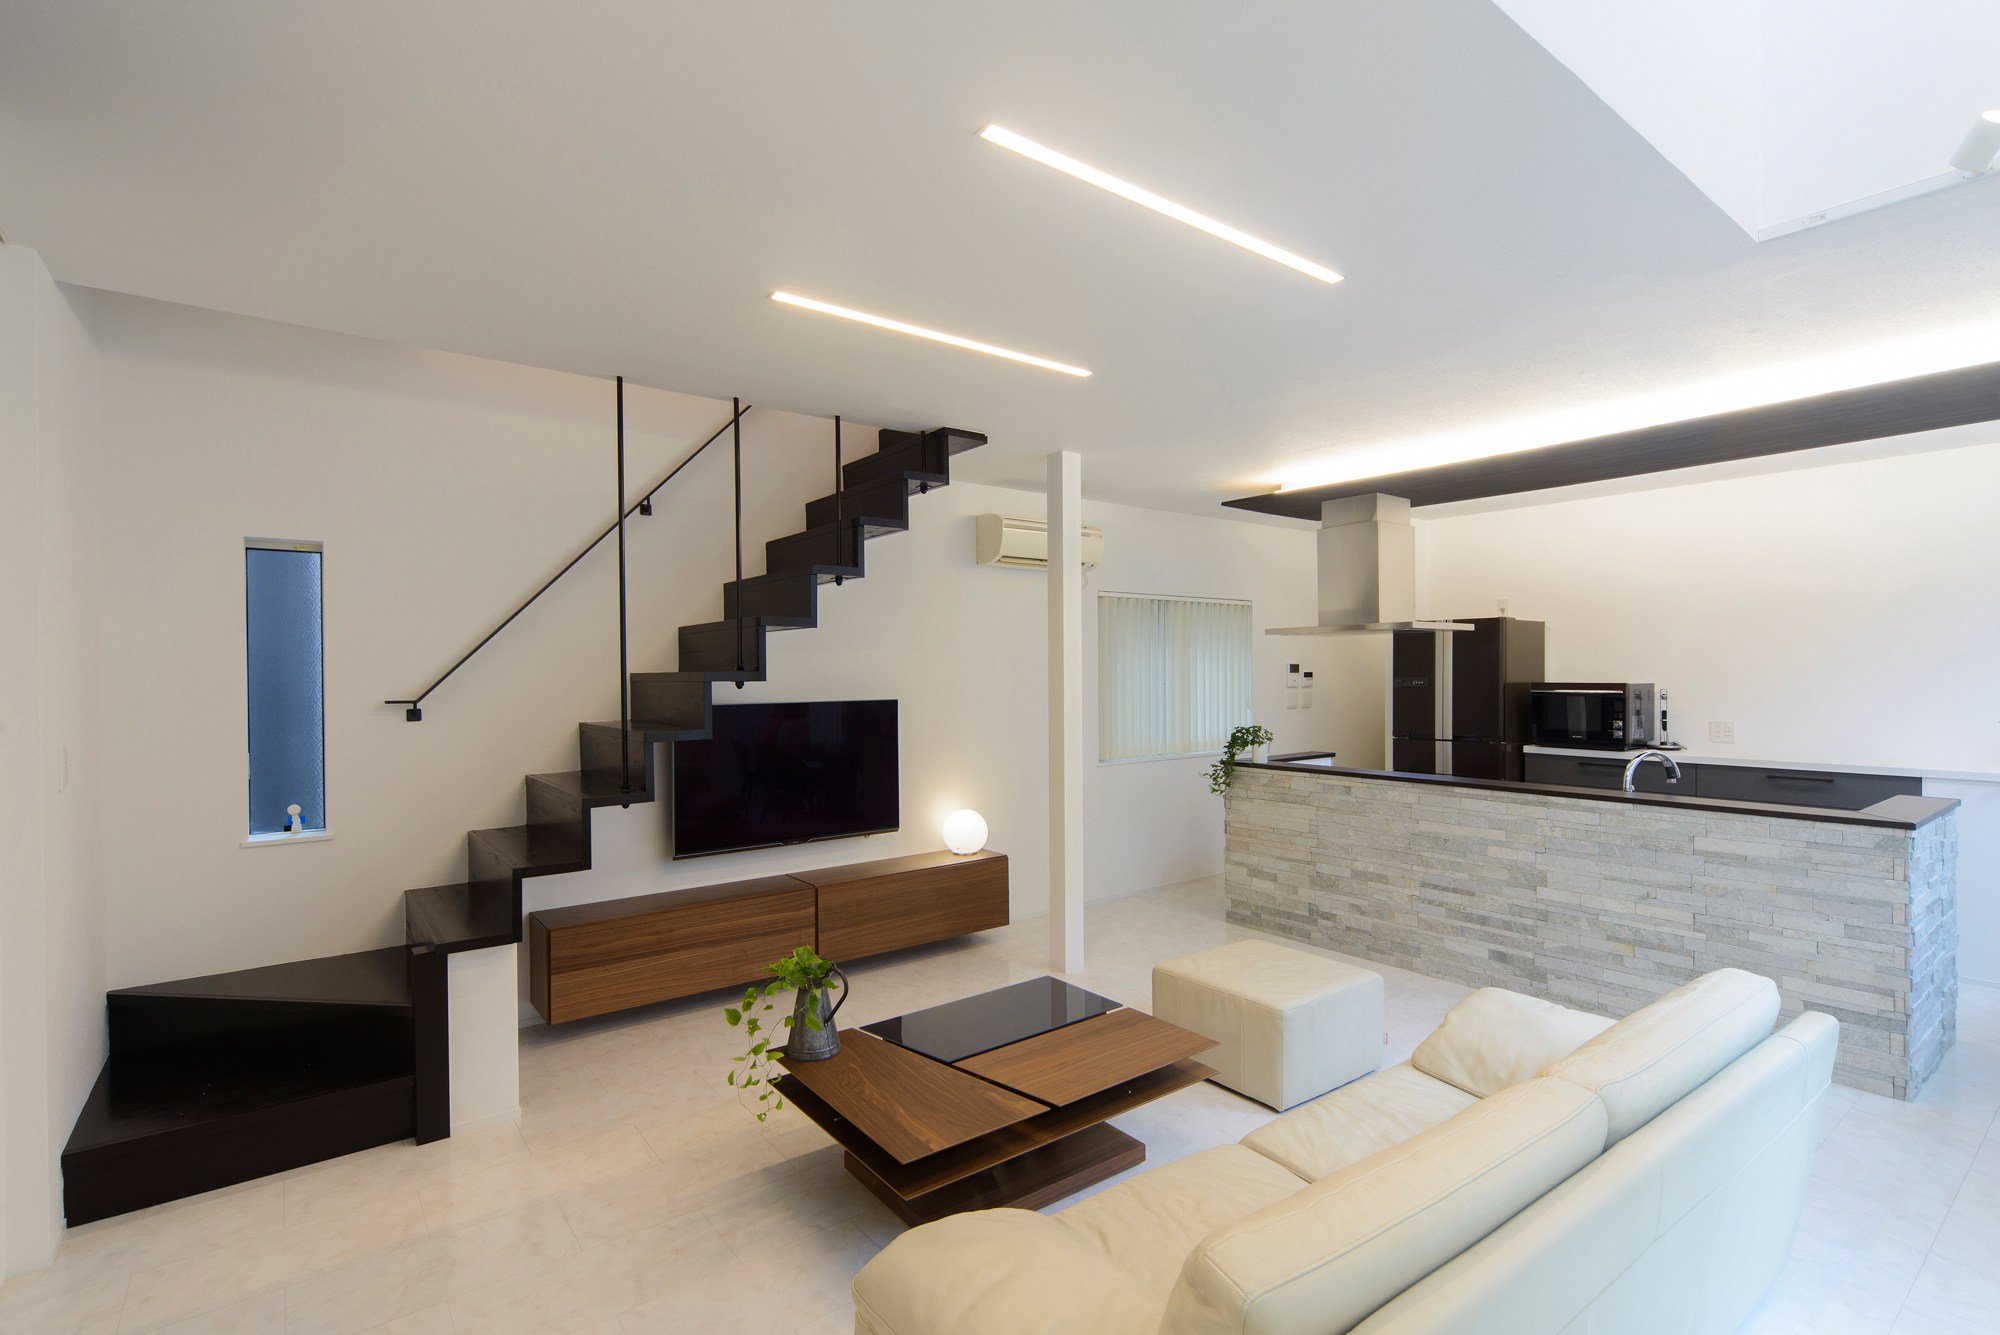 cool modern style